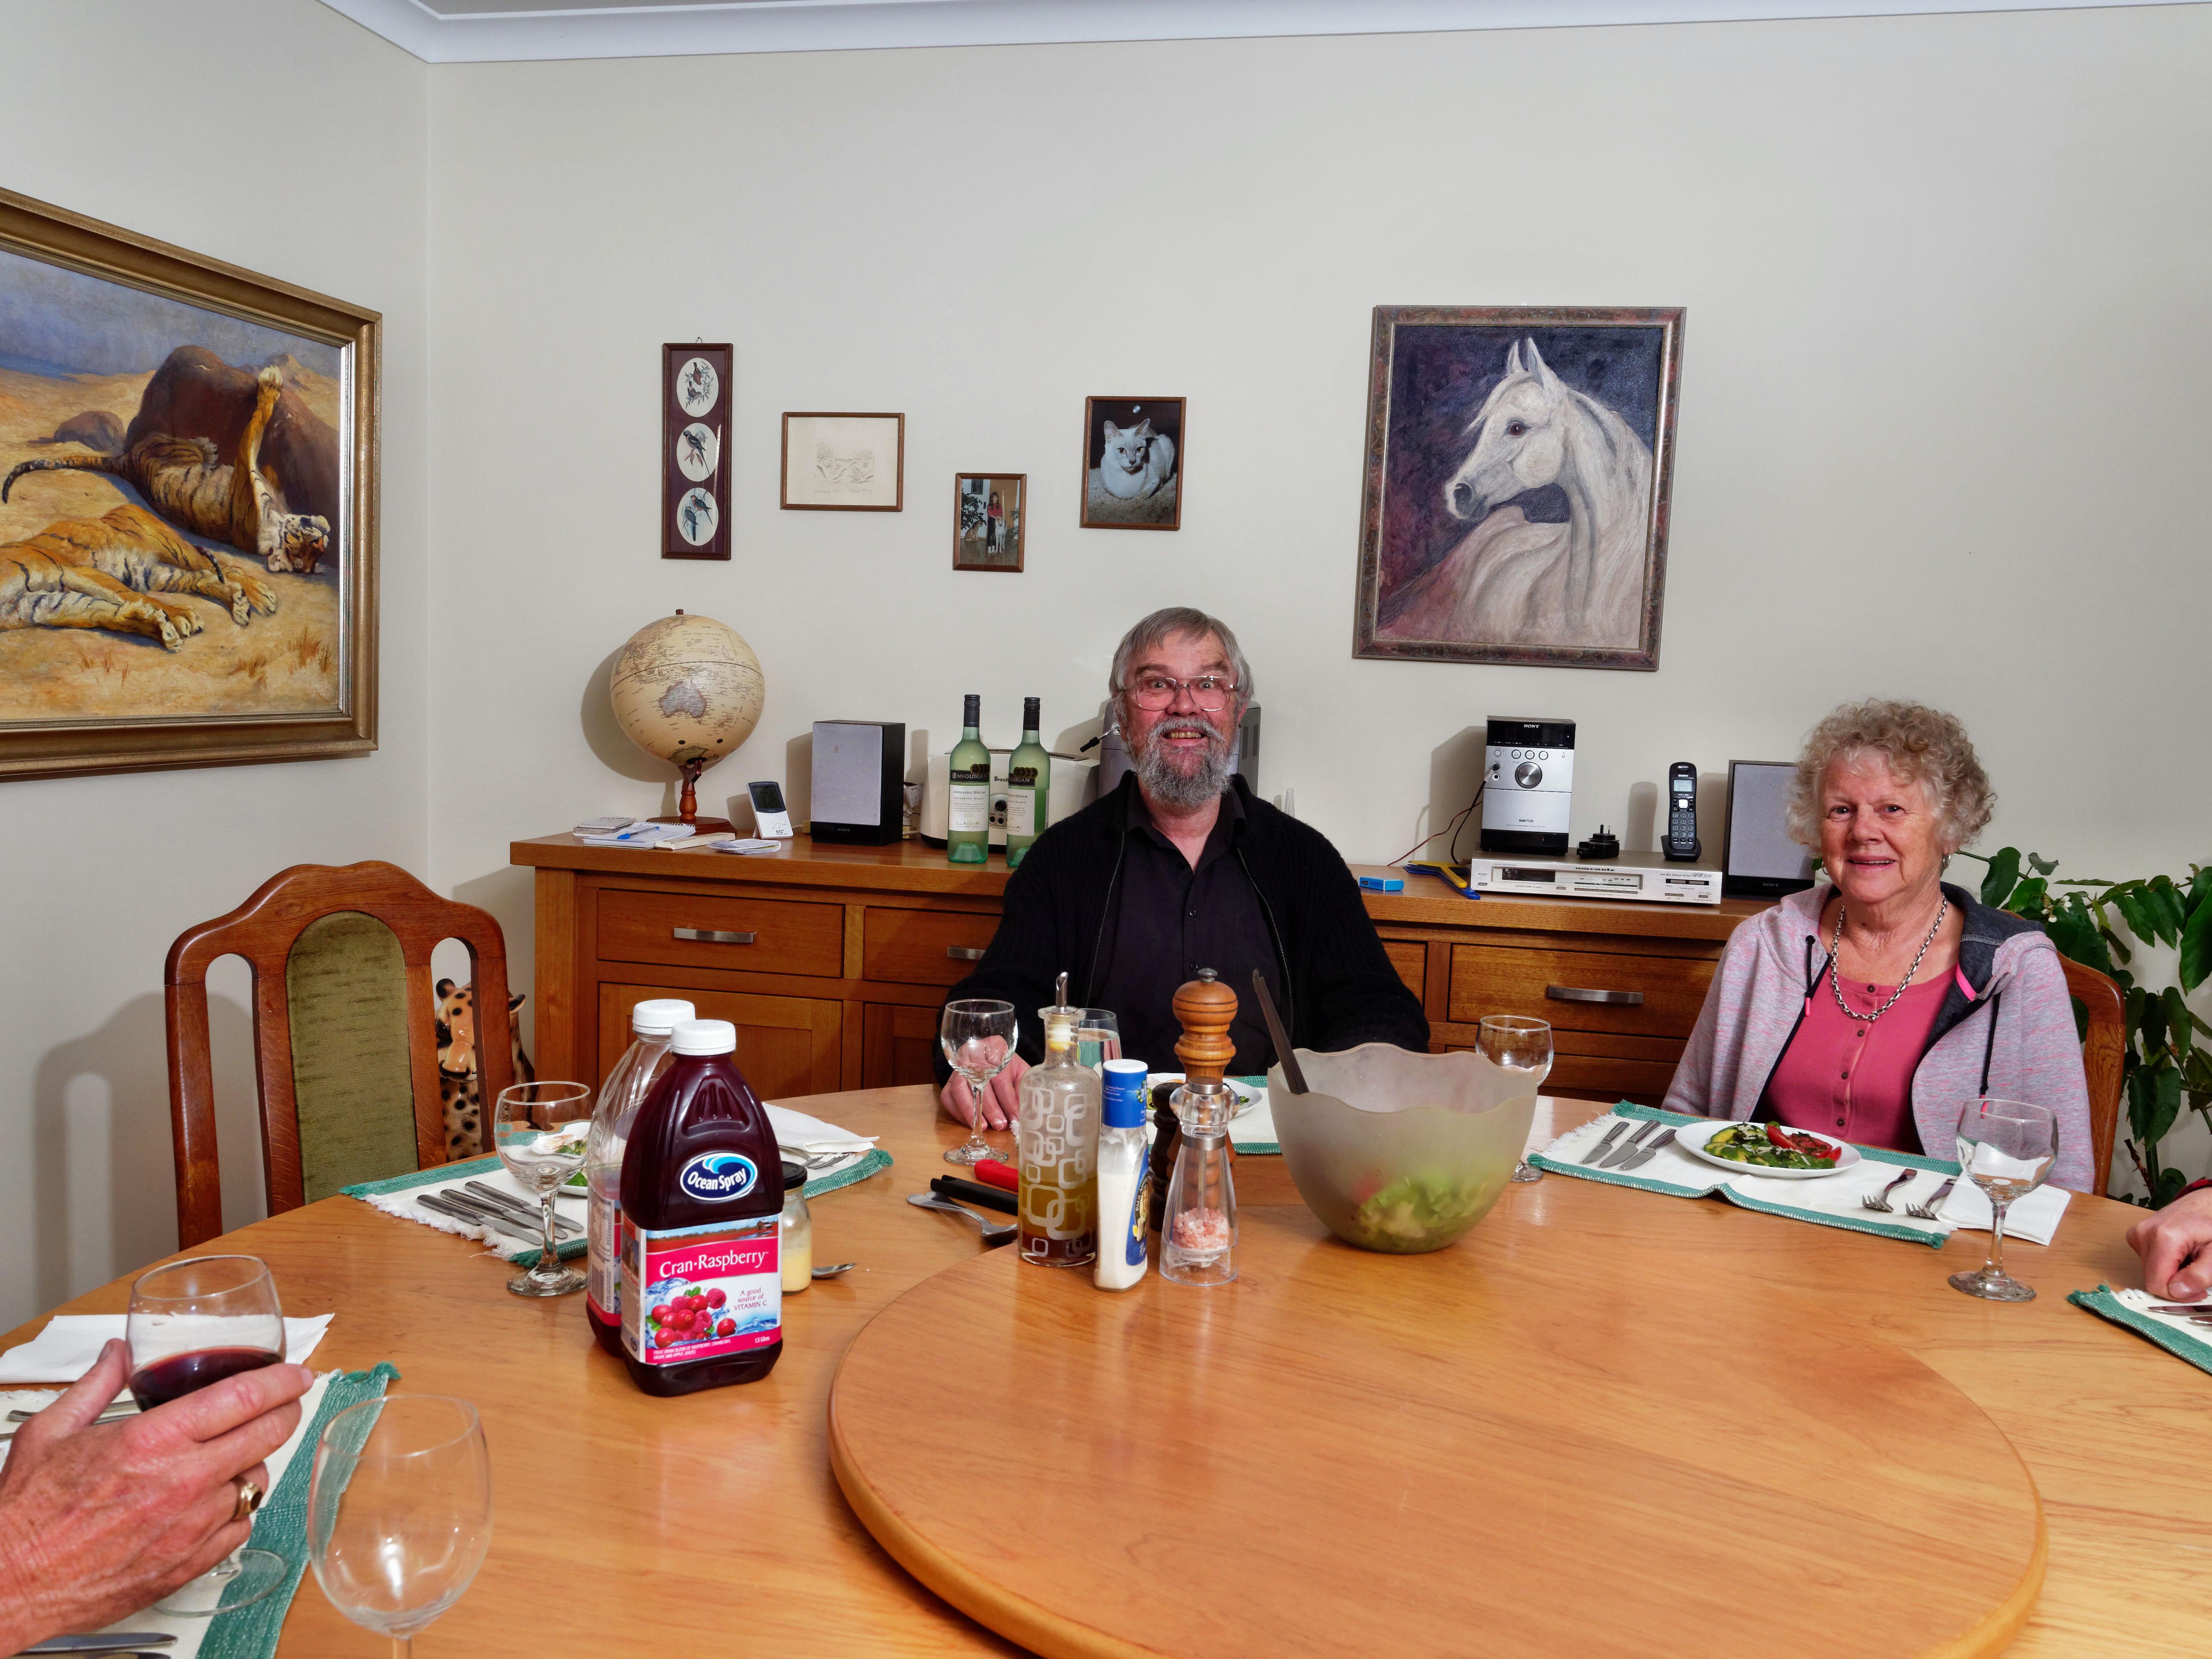 Dining-room-8.jpeg